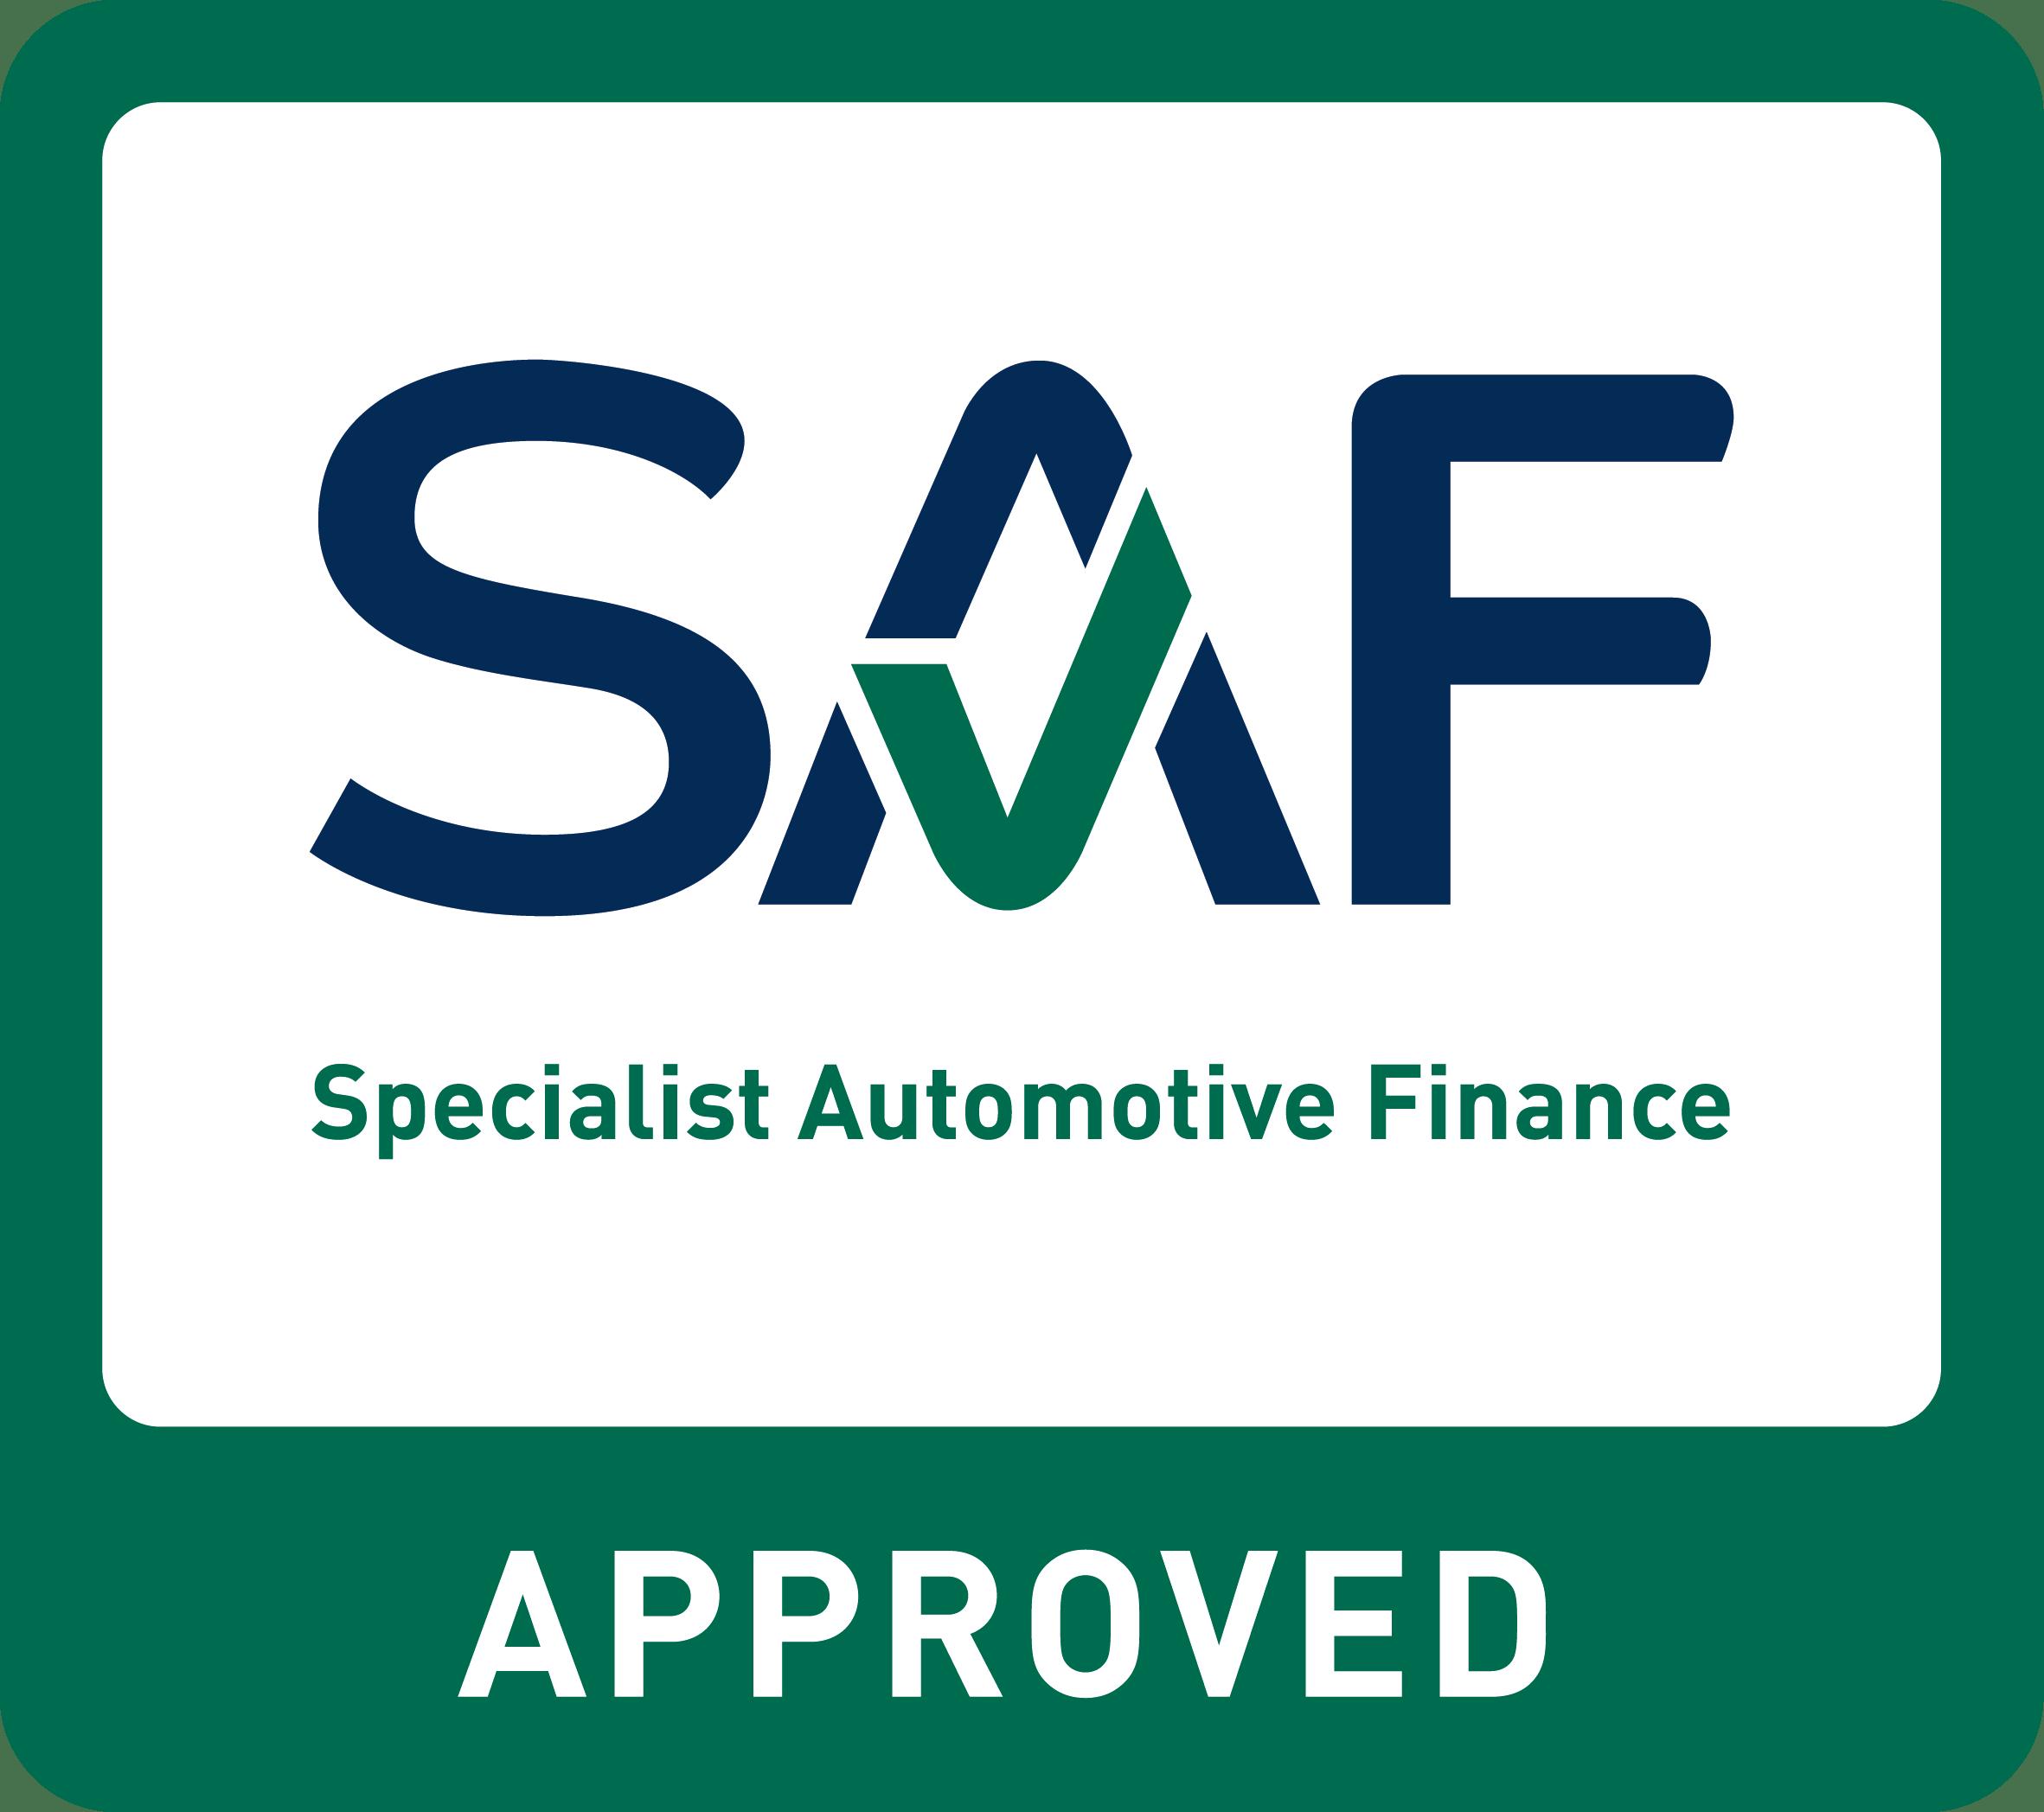 Capital Car Finance - SAF approved status